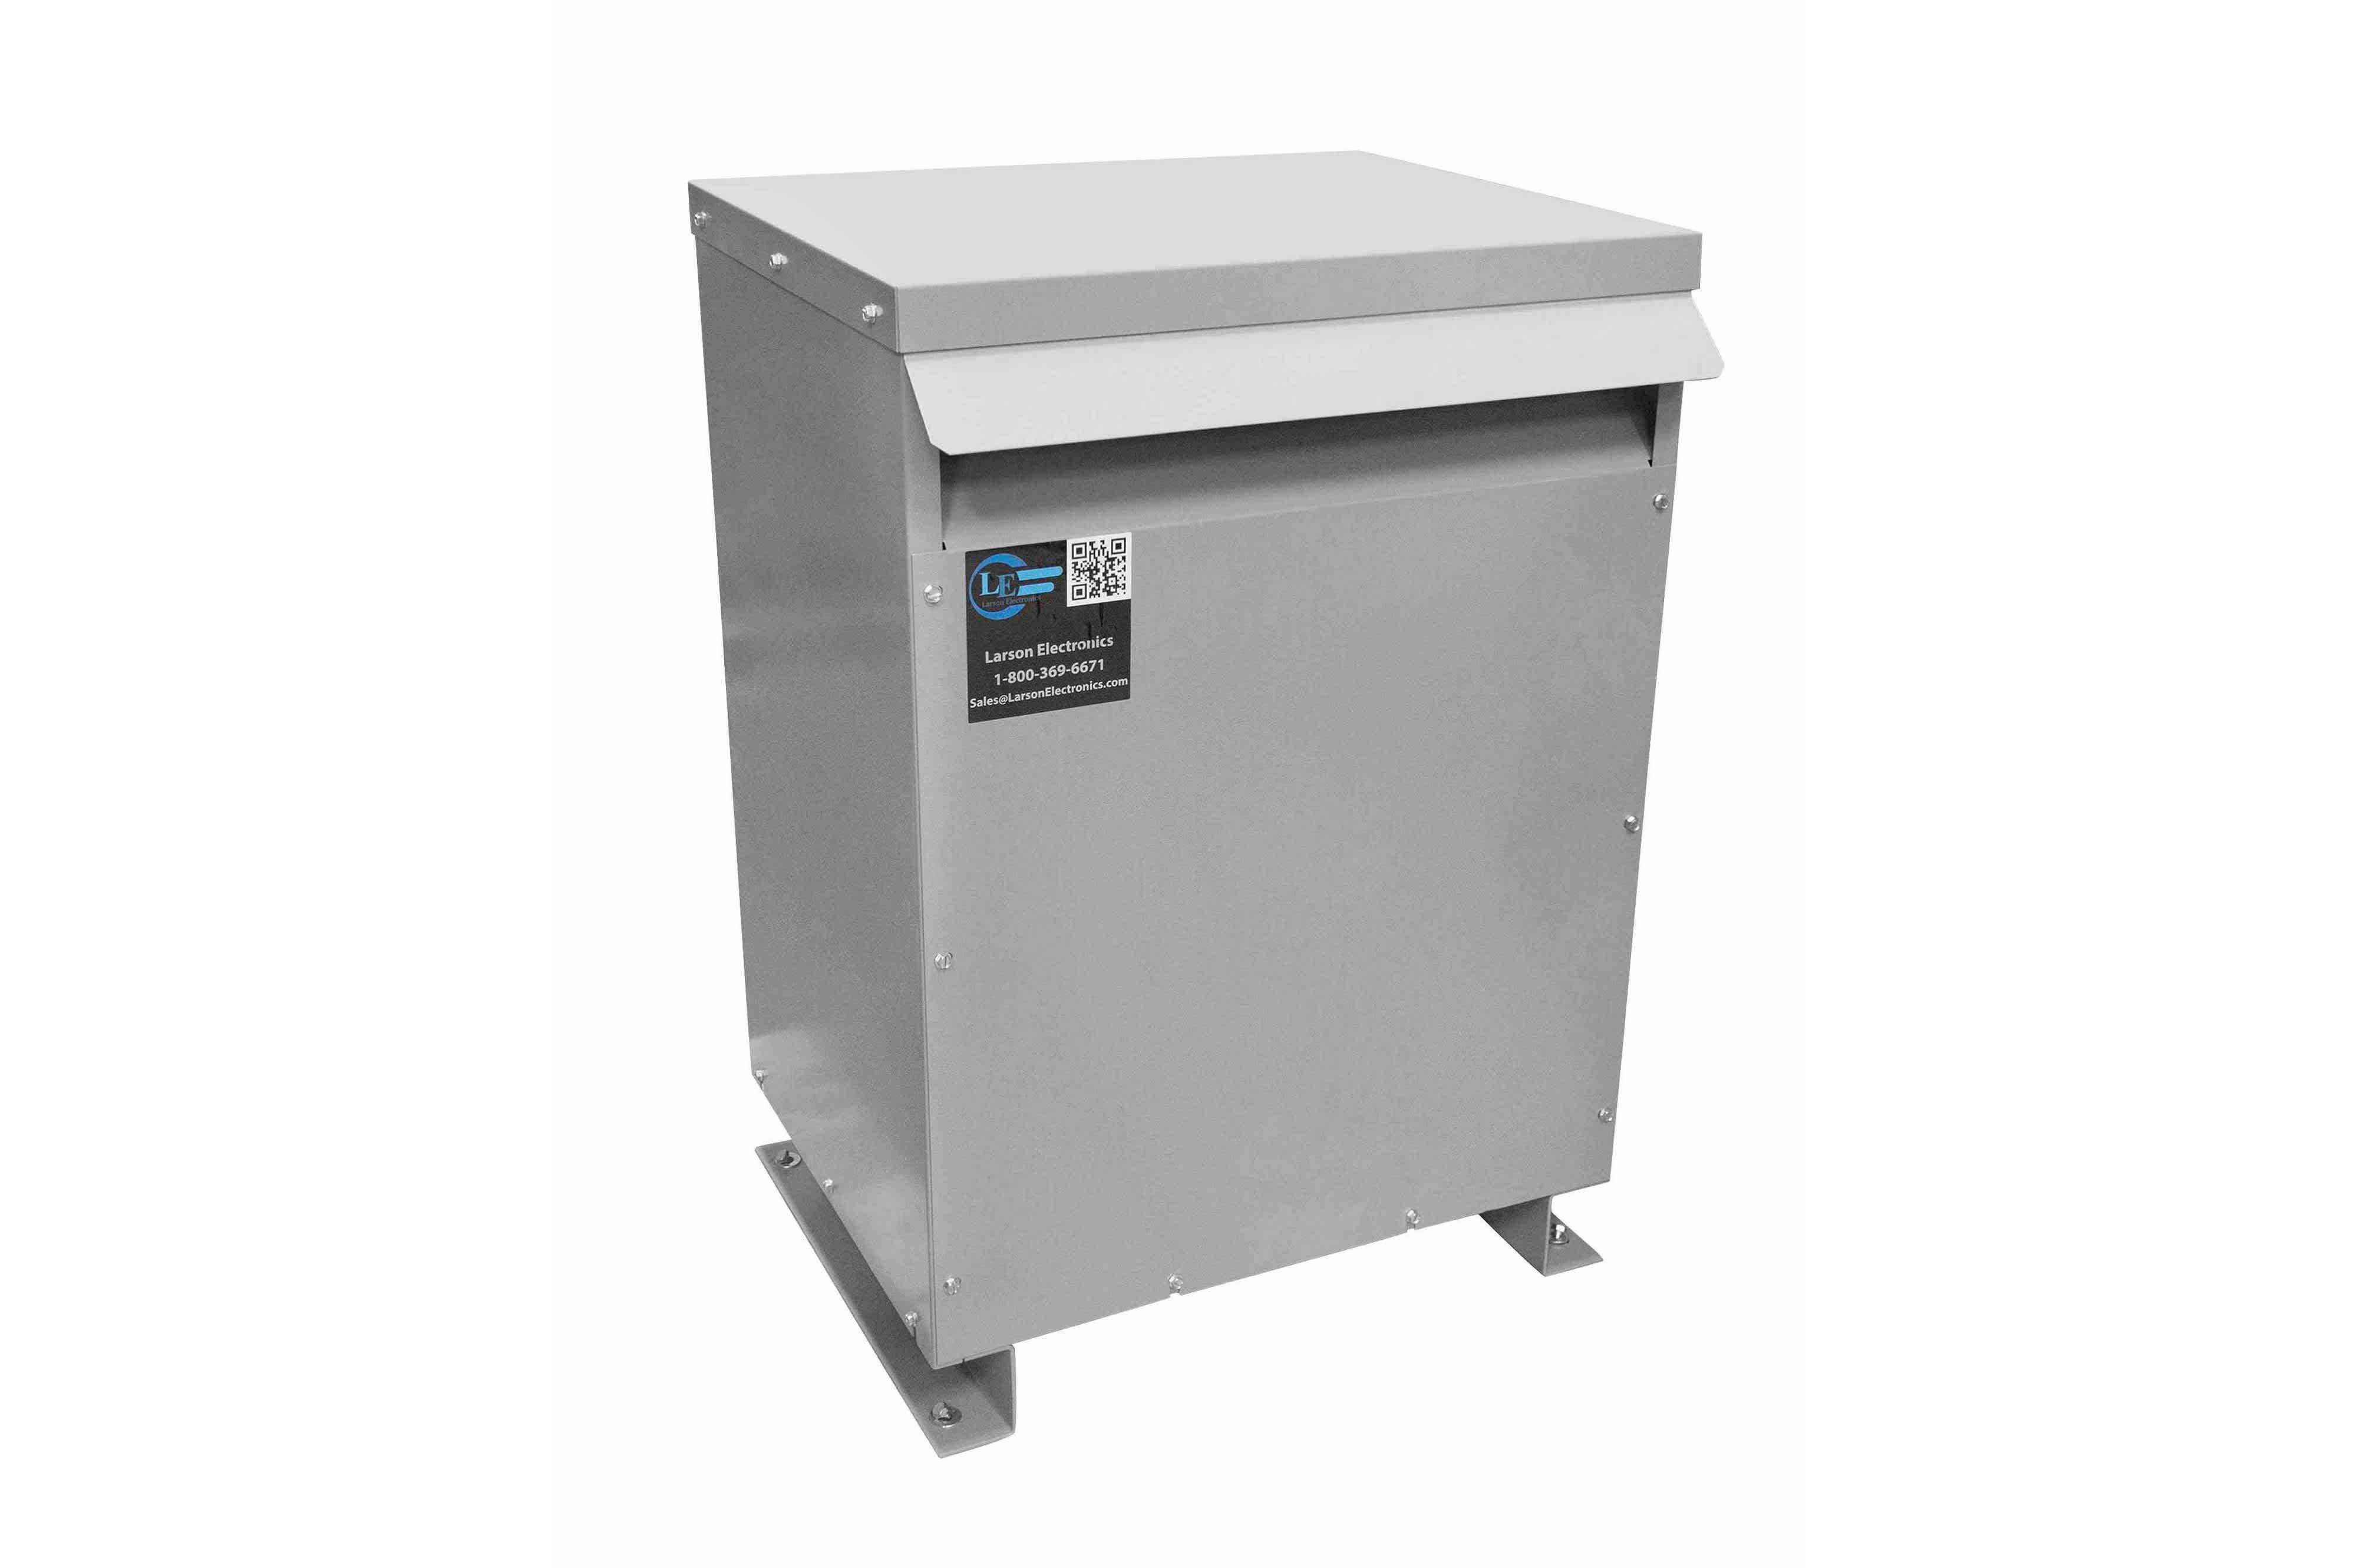 167 kVA 3PH Isolation Transformer, 600V Wye Primary, 415Y/240 Wye-N Secondary, N3R, Ventilated, 60 Hz